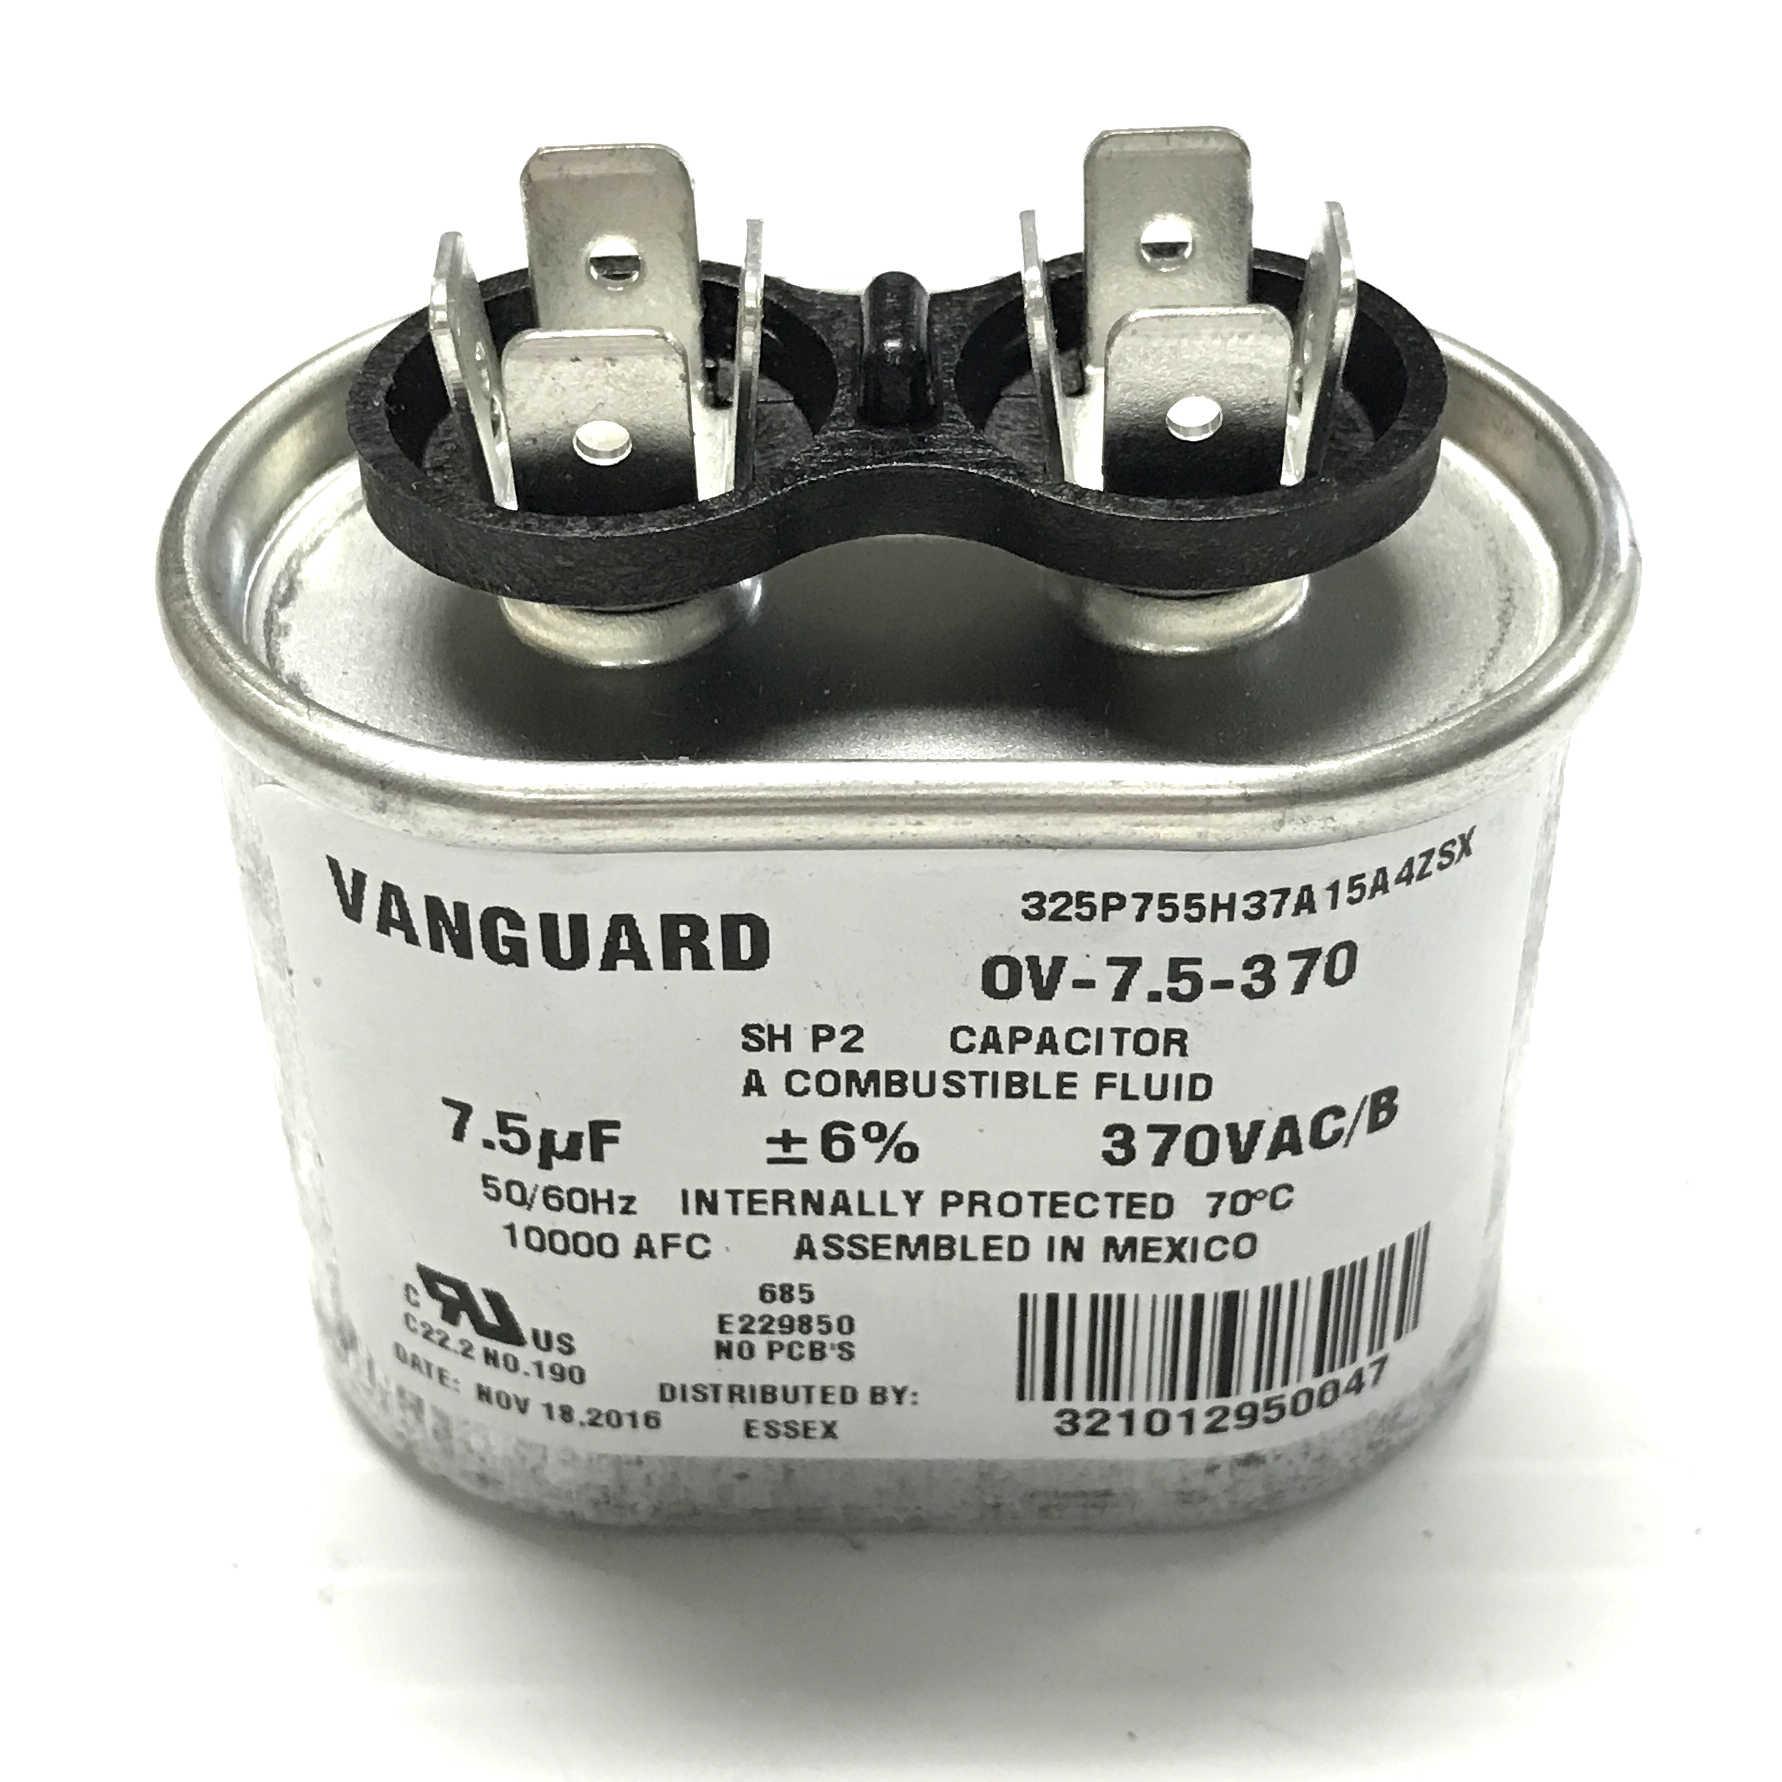 Ov 75 370 Vanguard Run Capacitor Vac F 40 Mfd Ac Motor Wiring Diagram Image01